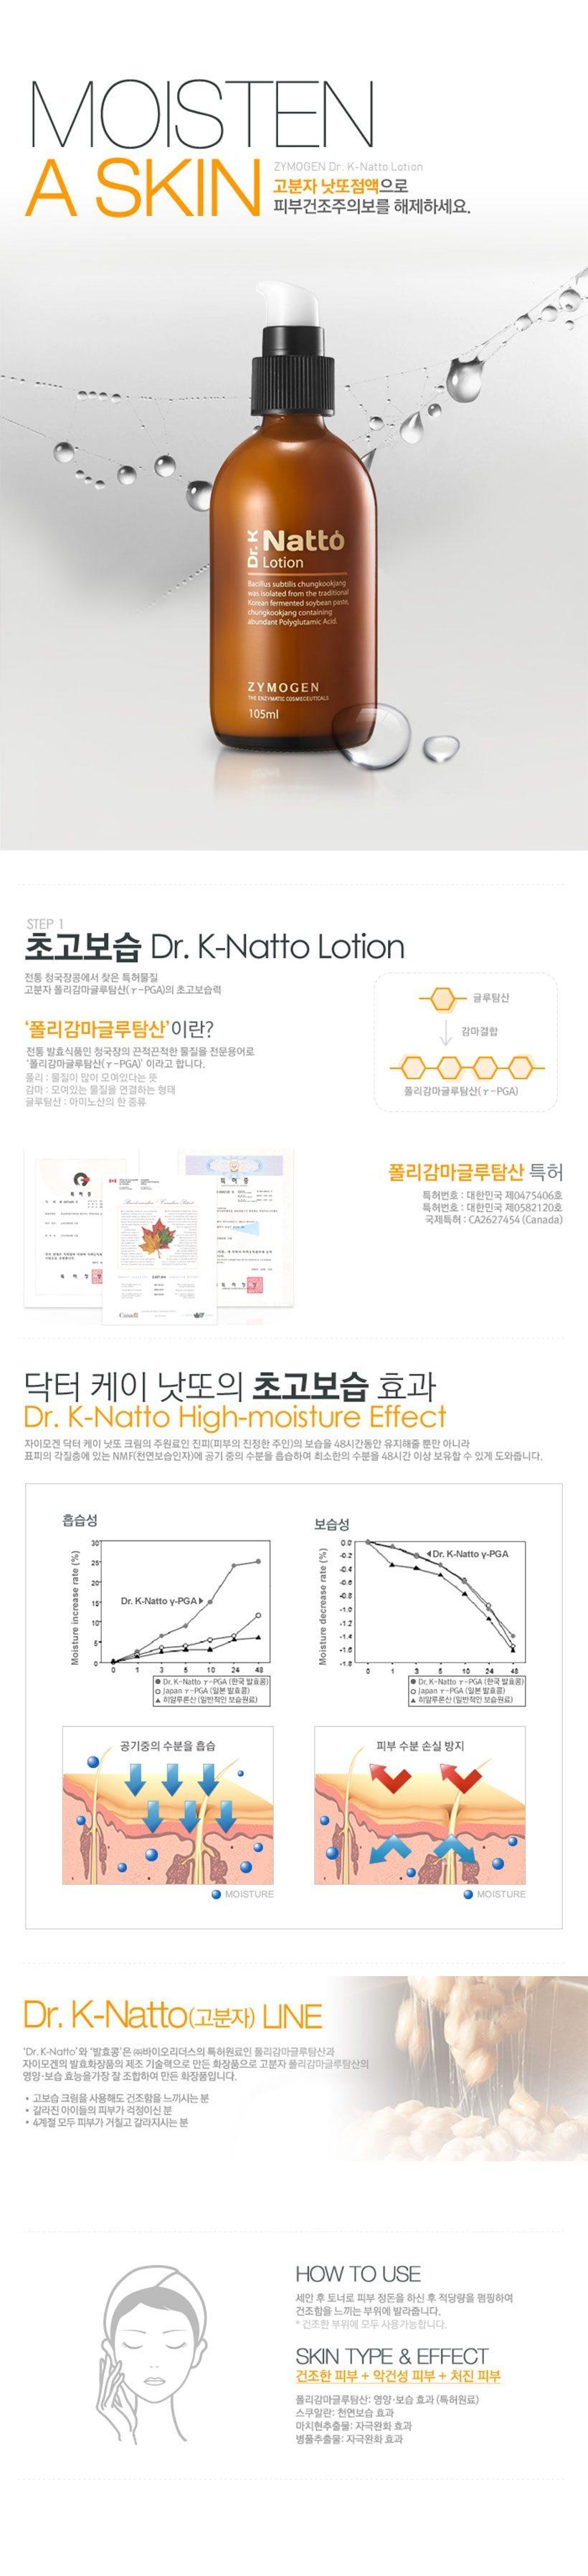 Zymogen Dr. K Natto Lotion korean cosmetic skincar product online shop malaysia brazil macau1